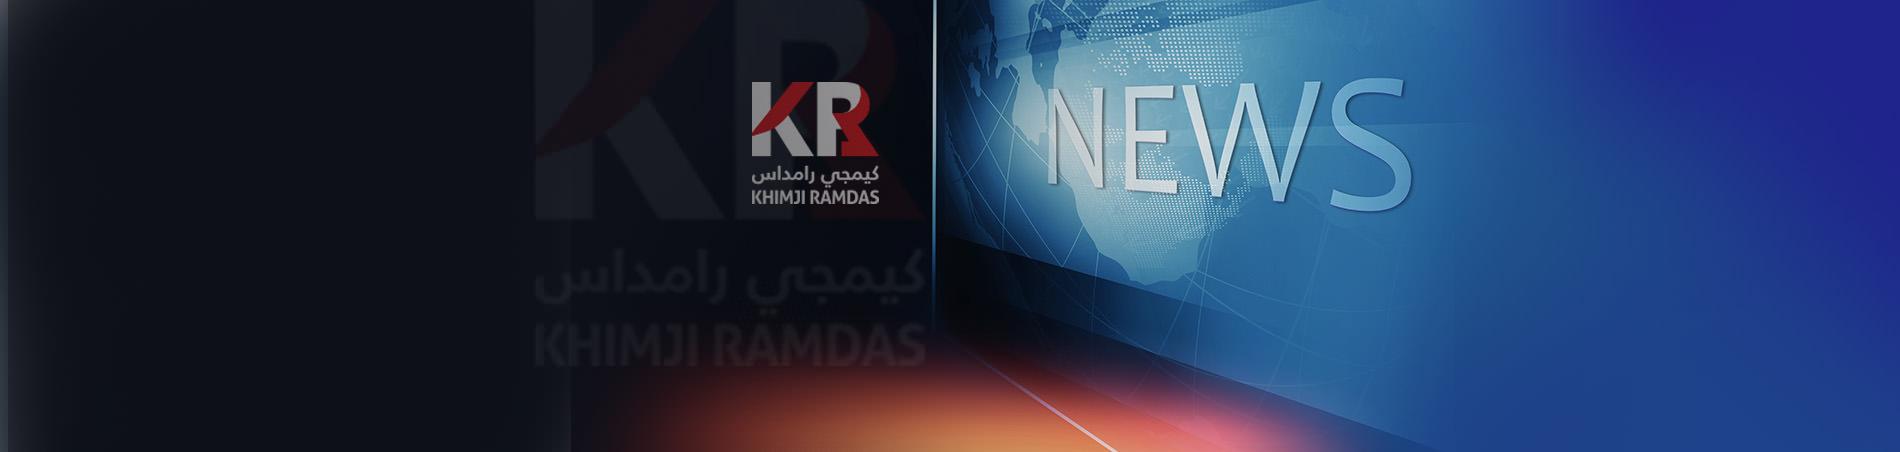 Press Releases Khimji Ramdas